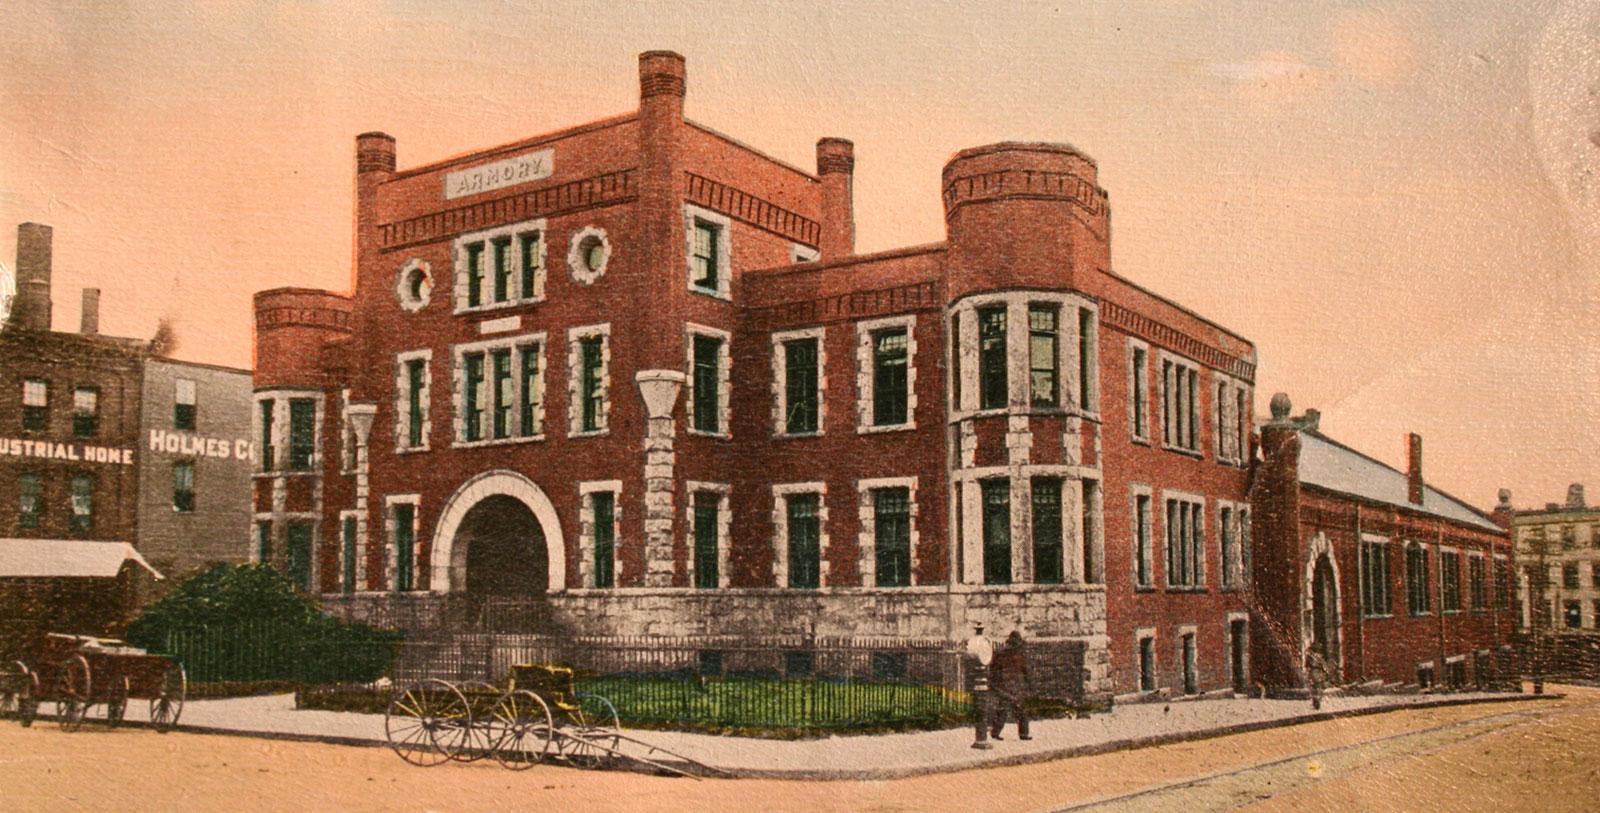 Image of Historic Exterior Postcard Portland Regency Hotel & Spa, 1895, Member of Historic Hotels of America, in Portland, Maine, History